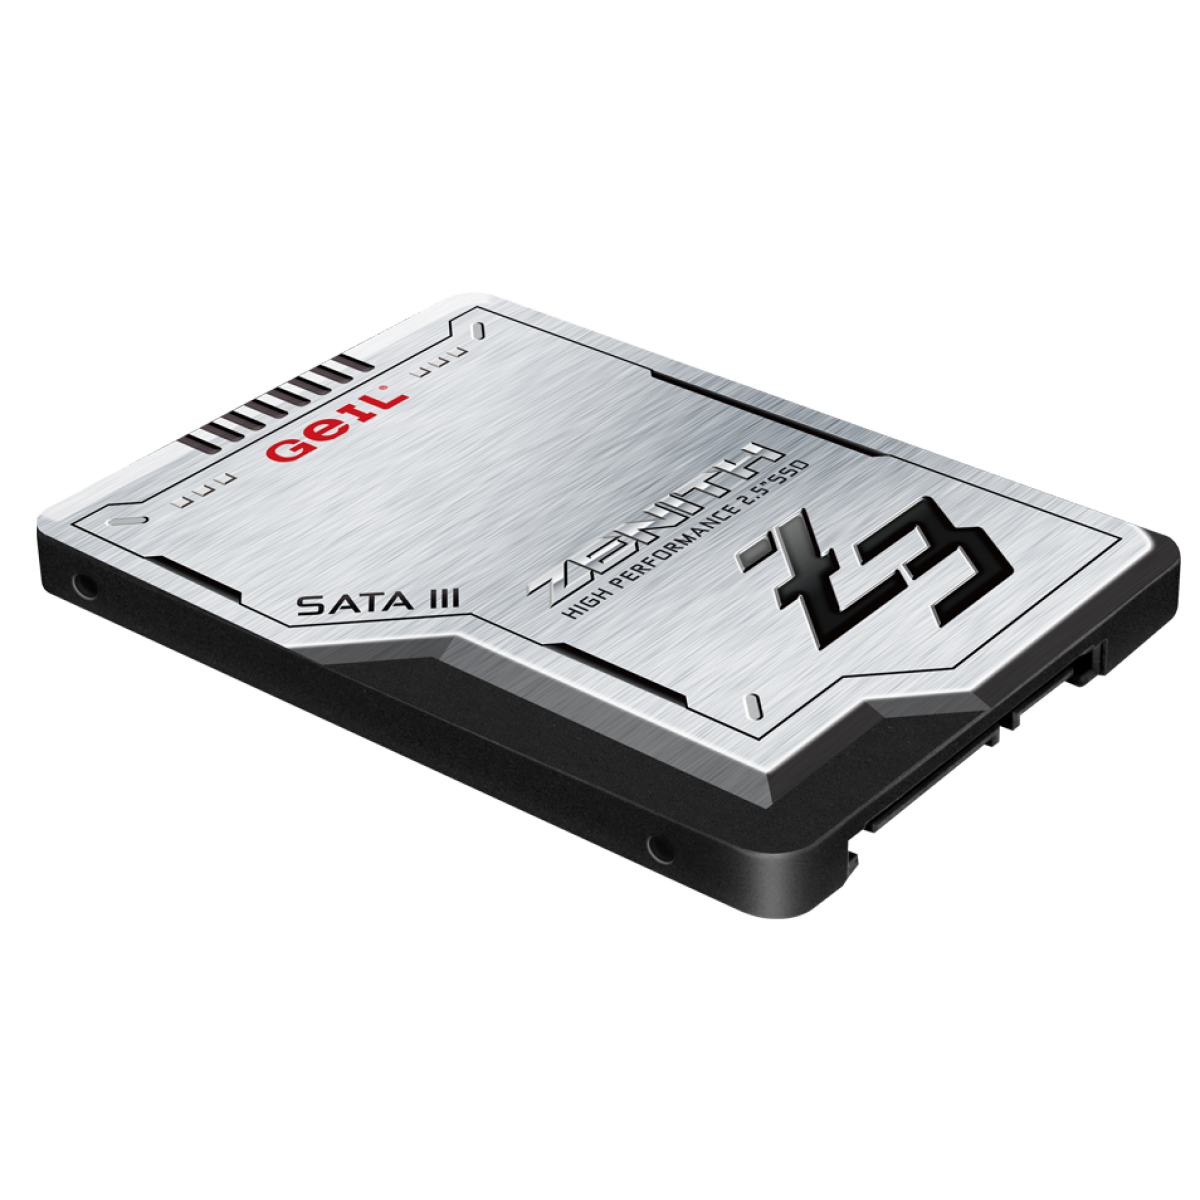 SSD Geil Zenith Z3, 1TB, Sata III, Leitura 520MBs e Gravação 470MBs, GZ25Z3-1TBP